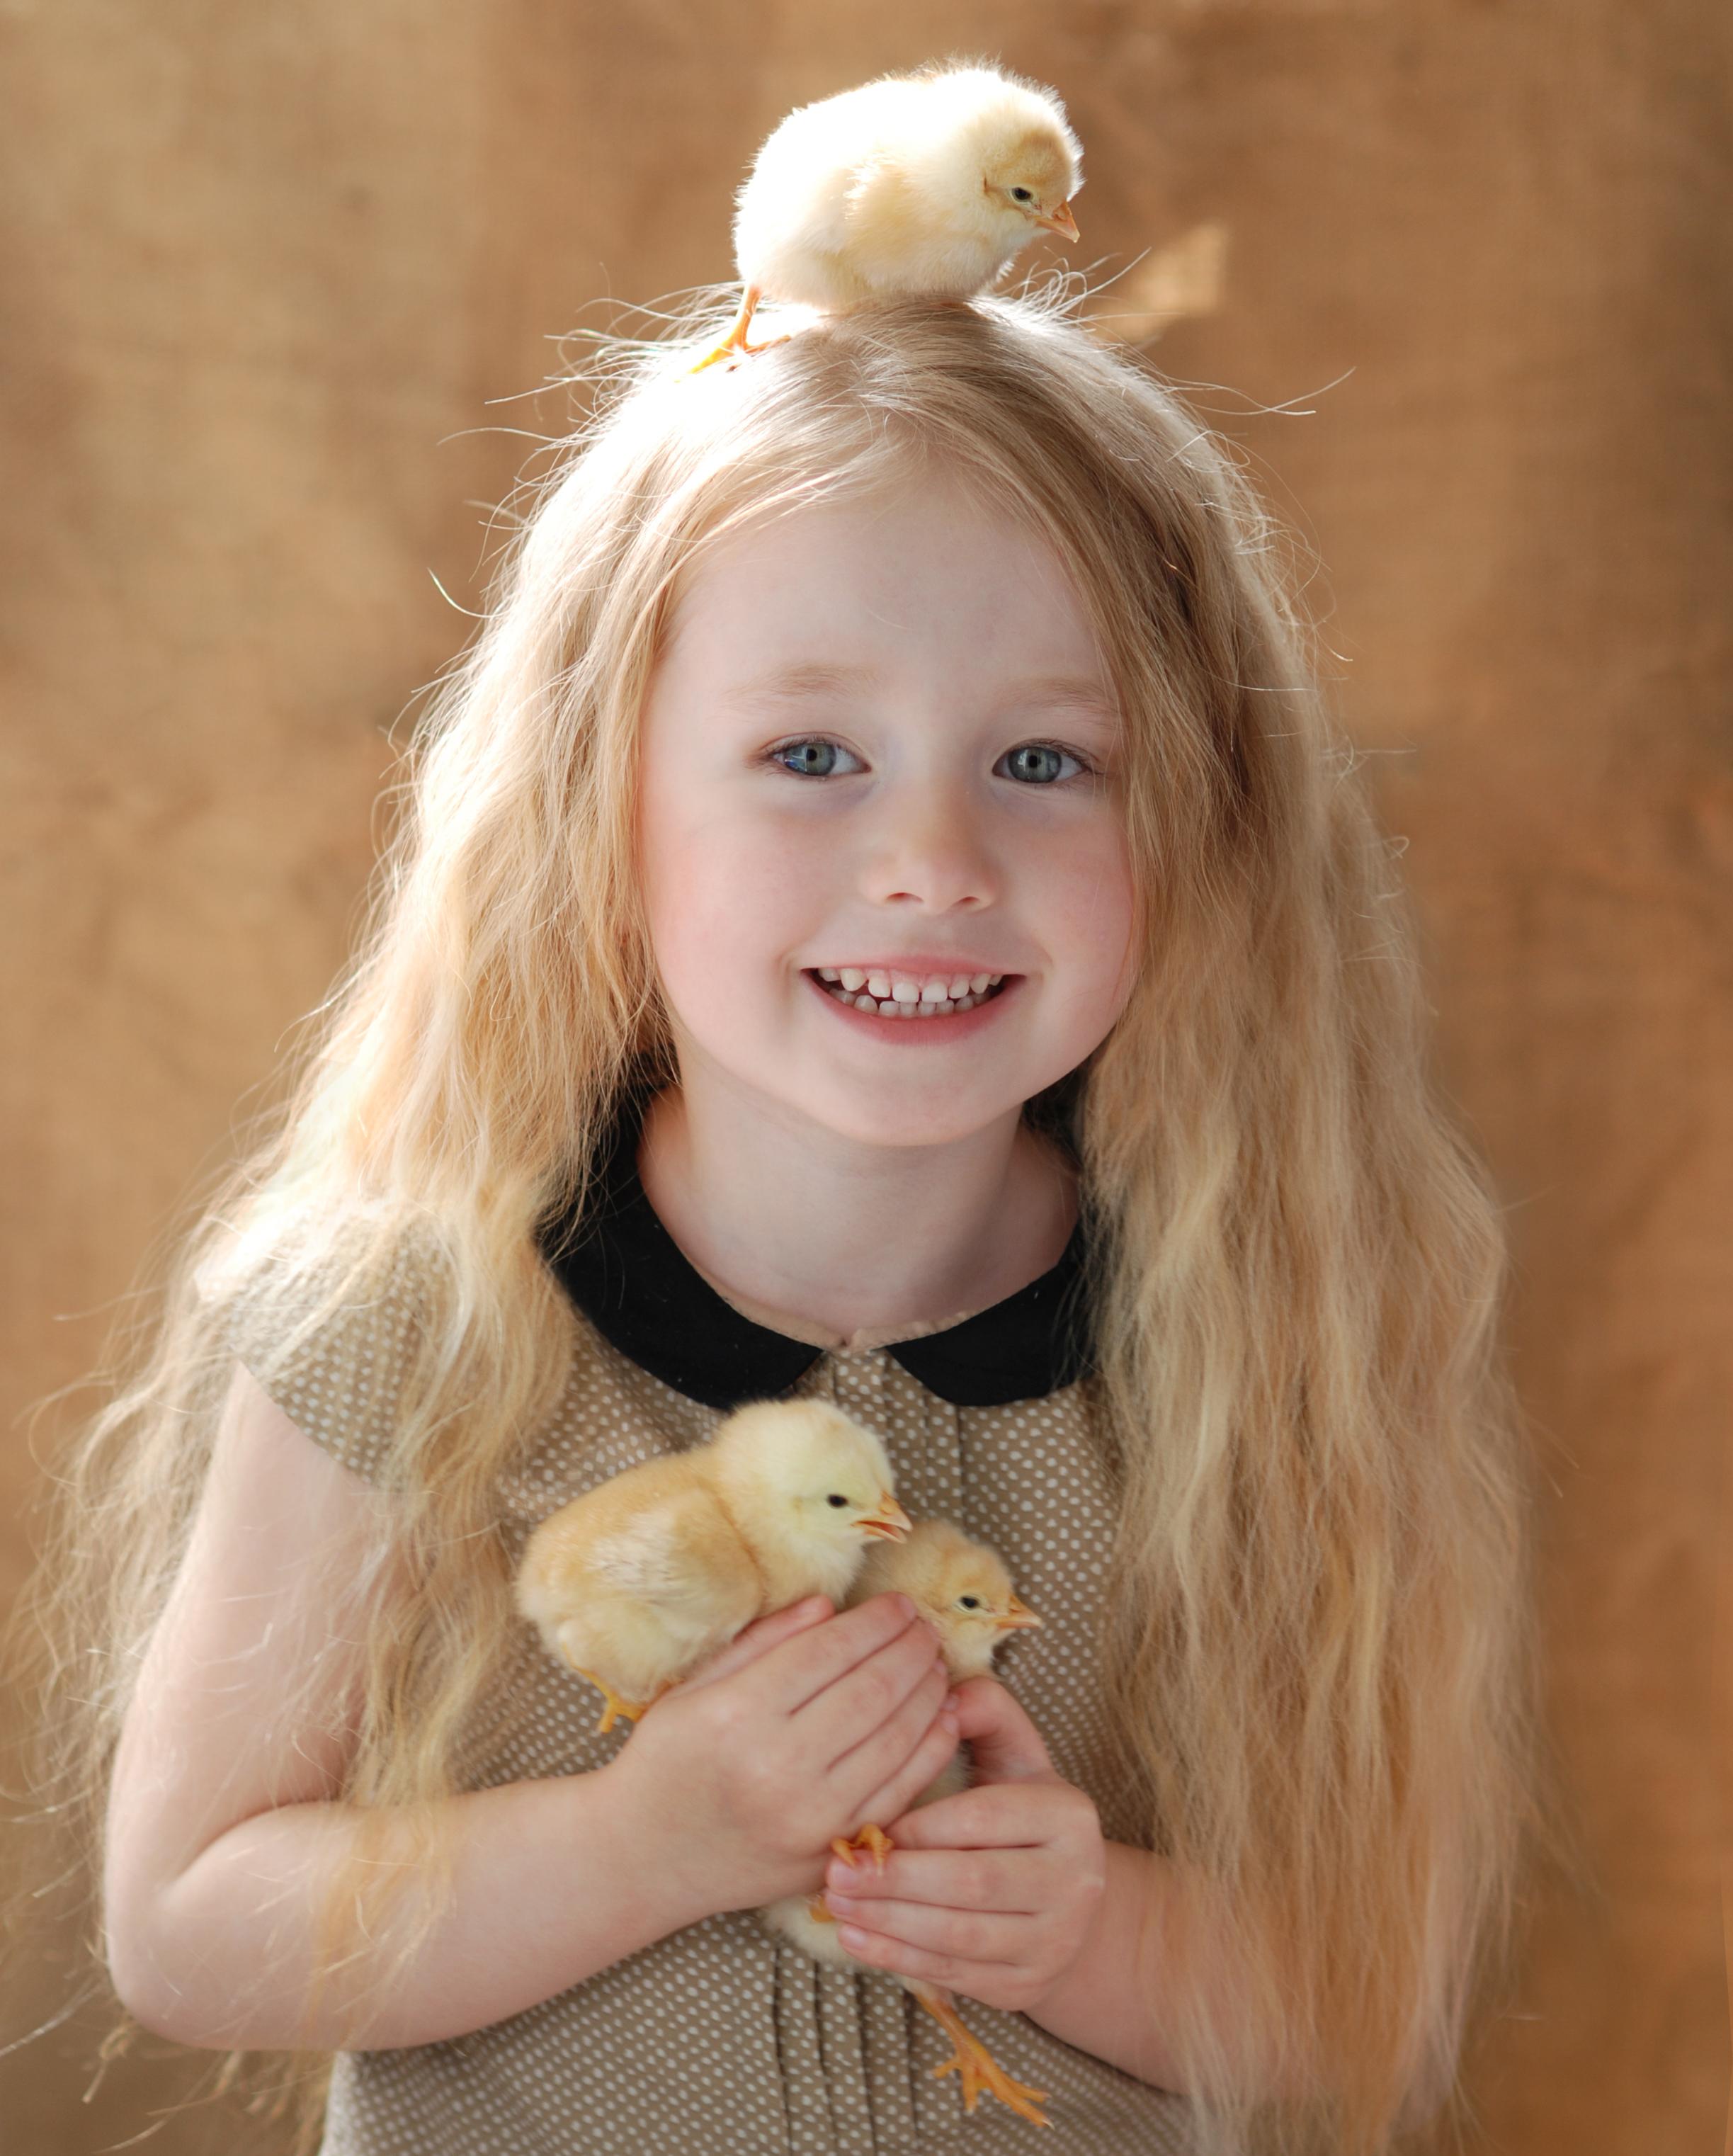 littlegirl | Explore littlegirl on DeviantArt